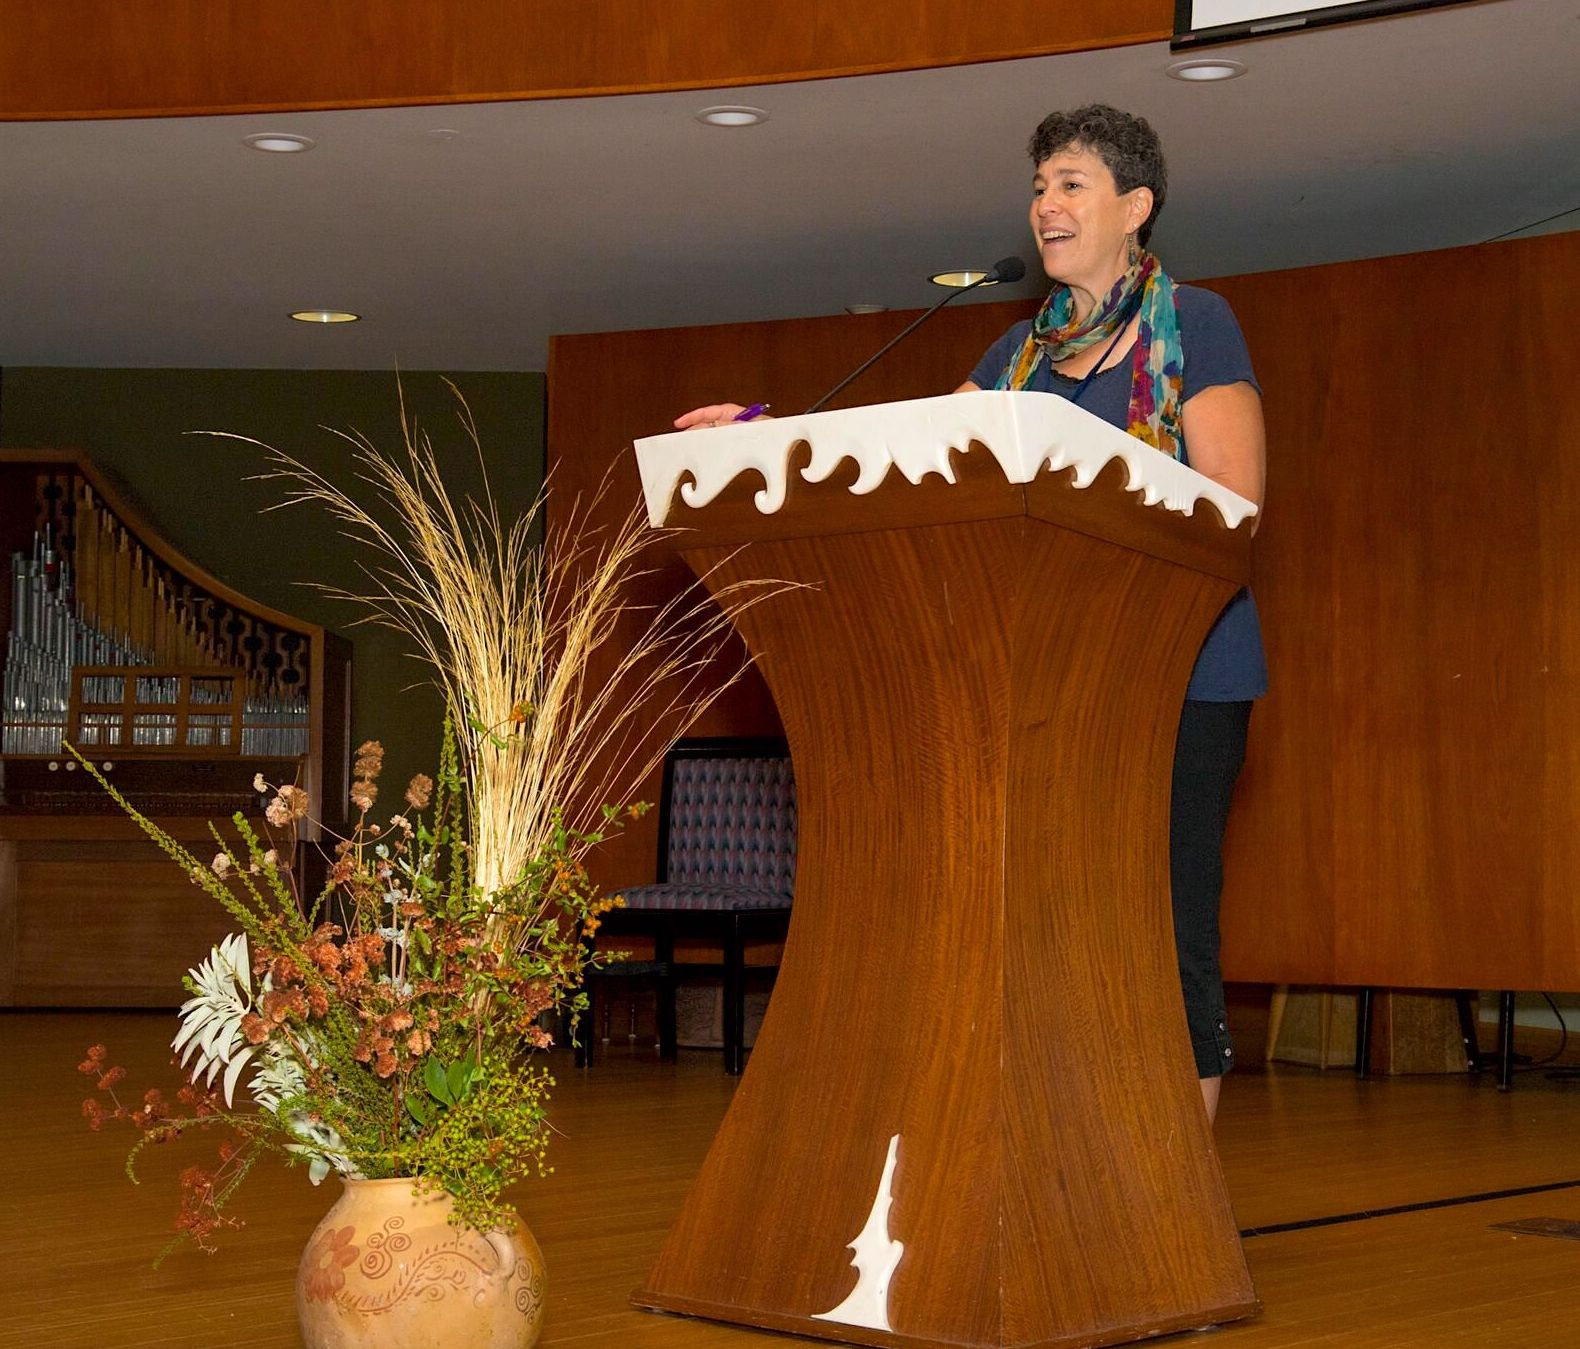 Judie Lincer at podium.jpg